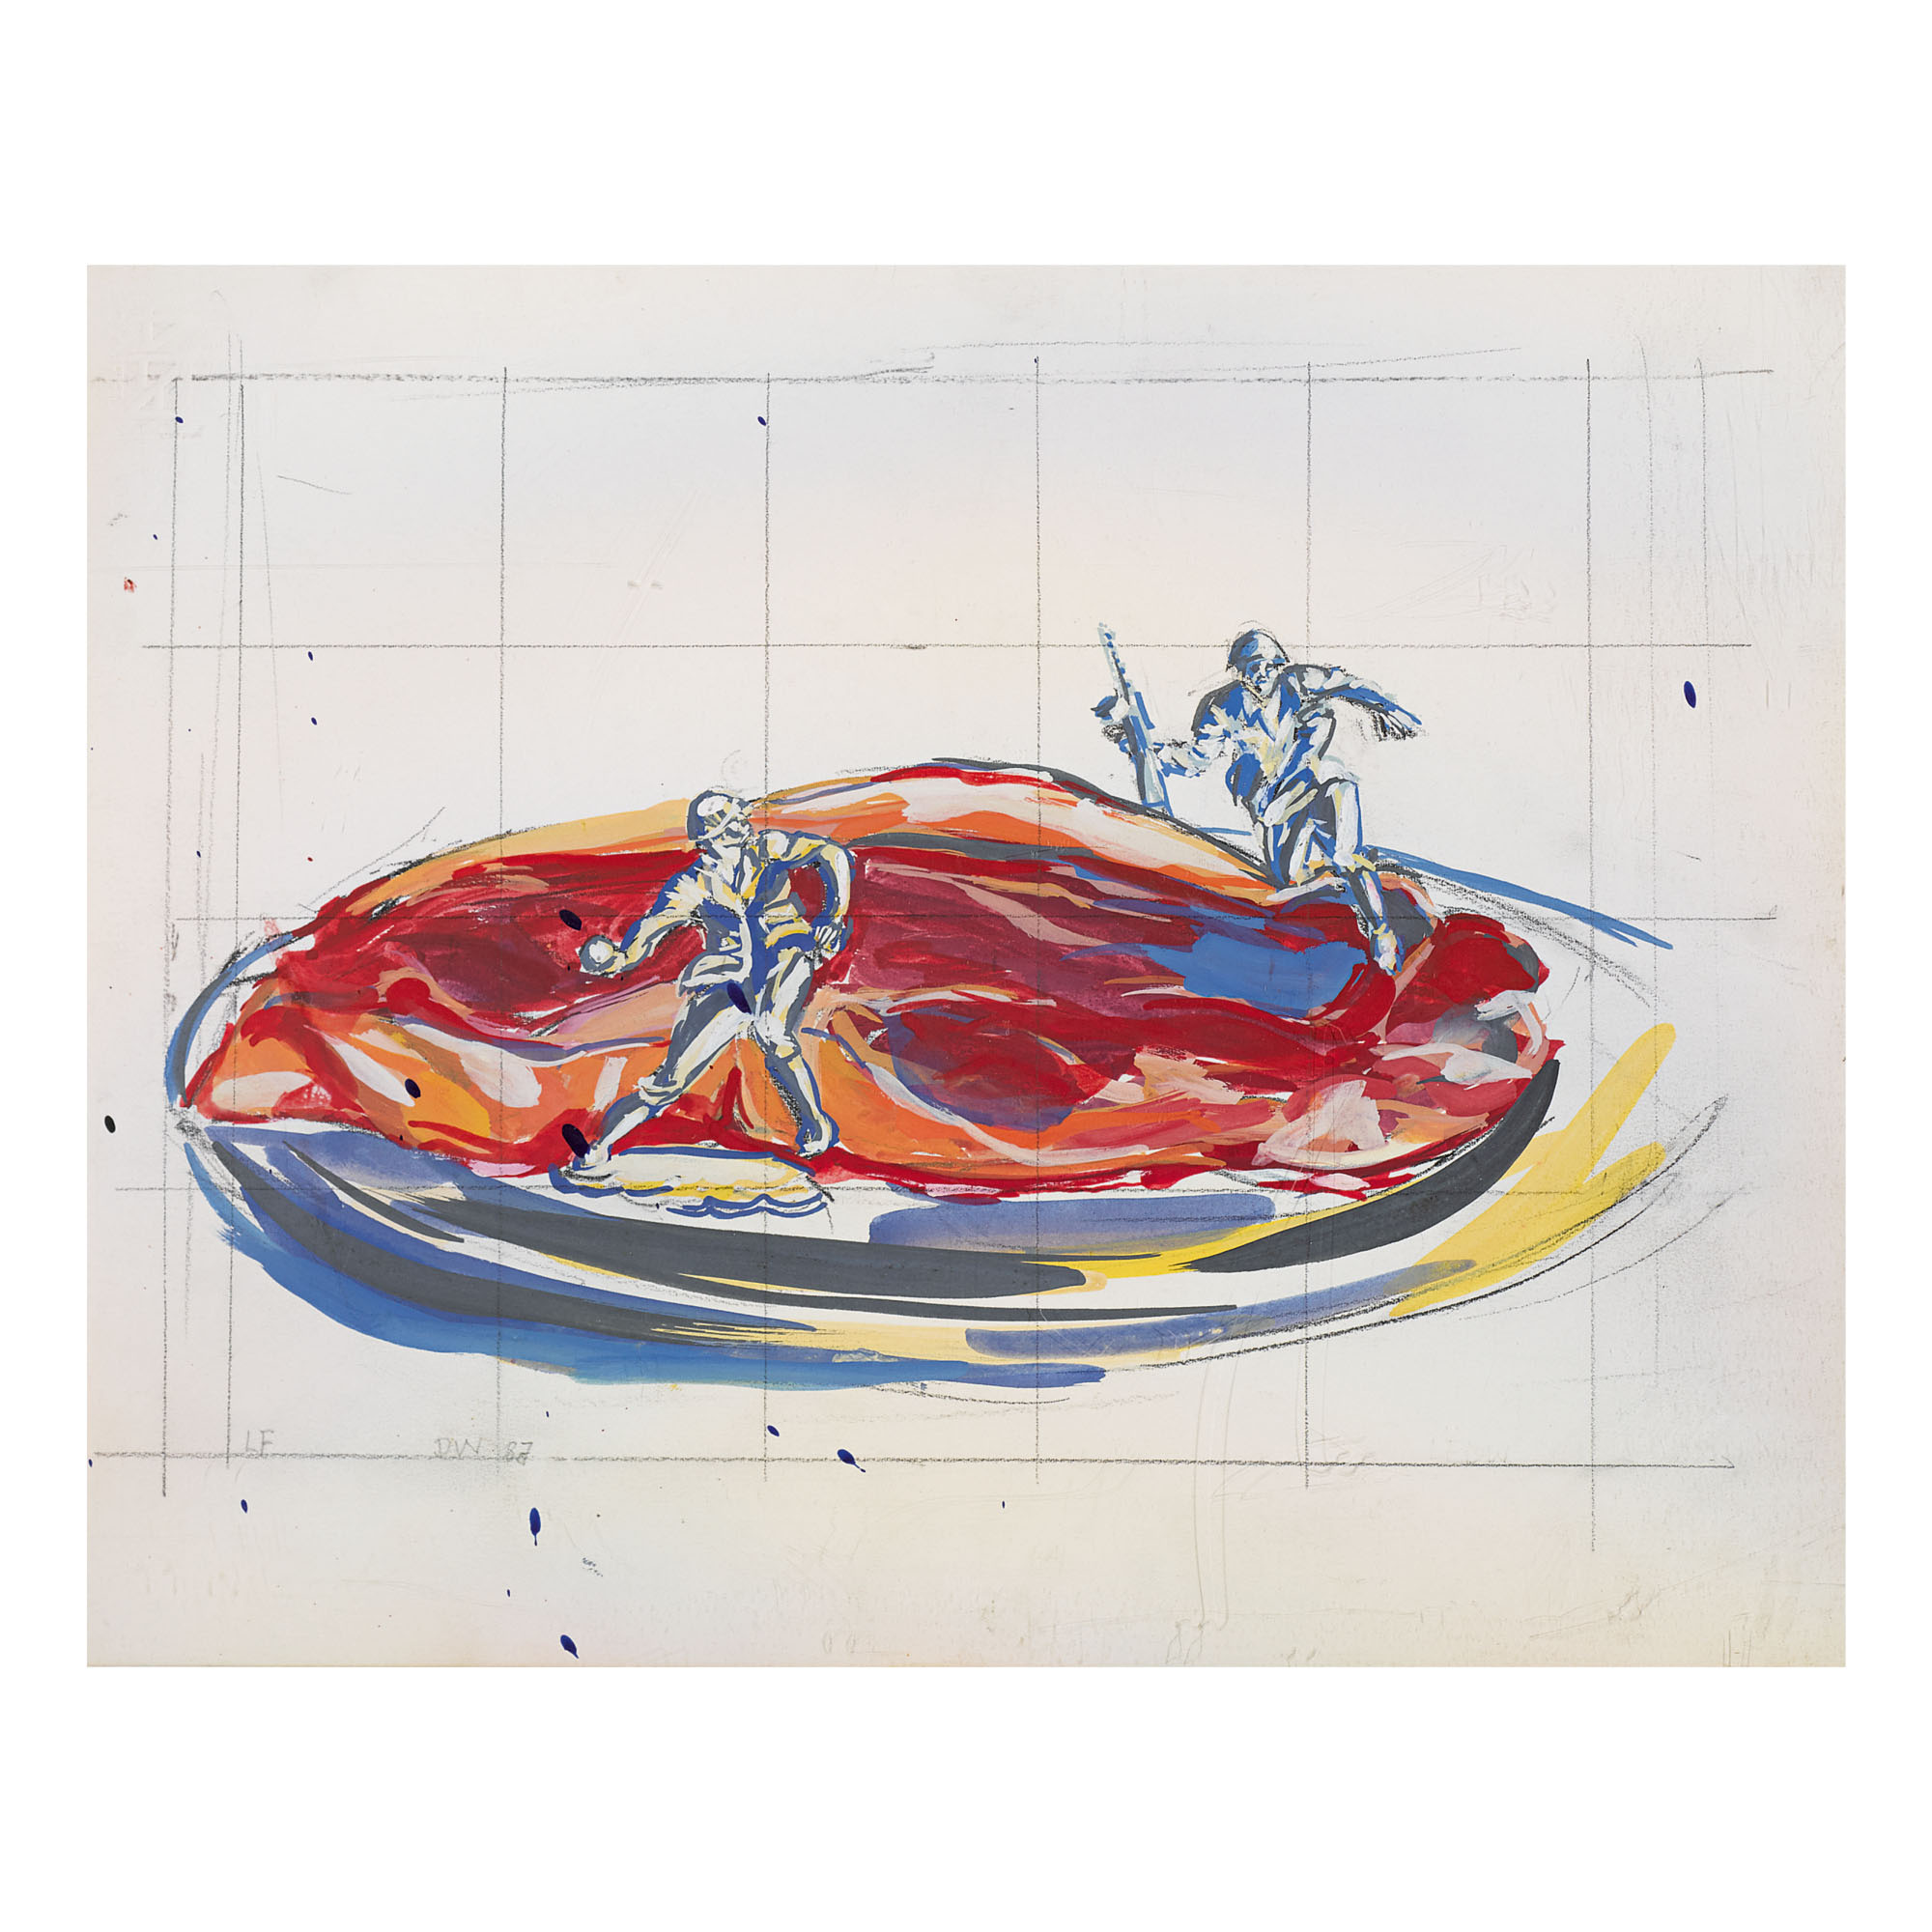 DAVID WOJNAROWICZ & LUIS FRANGELLA | UNTITLED (STEAK ON A PLATE WITH WARRIORS)